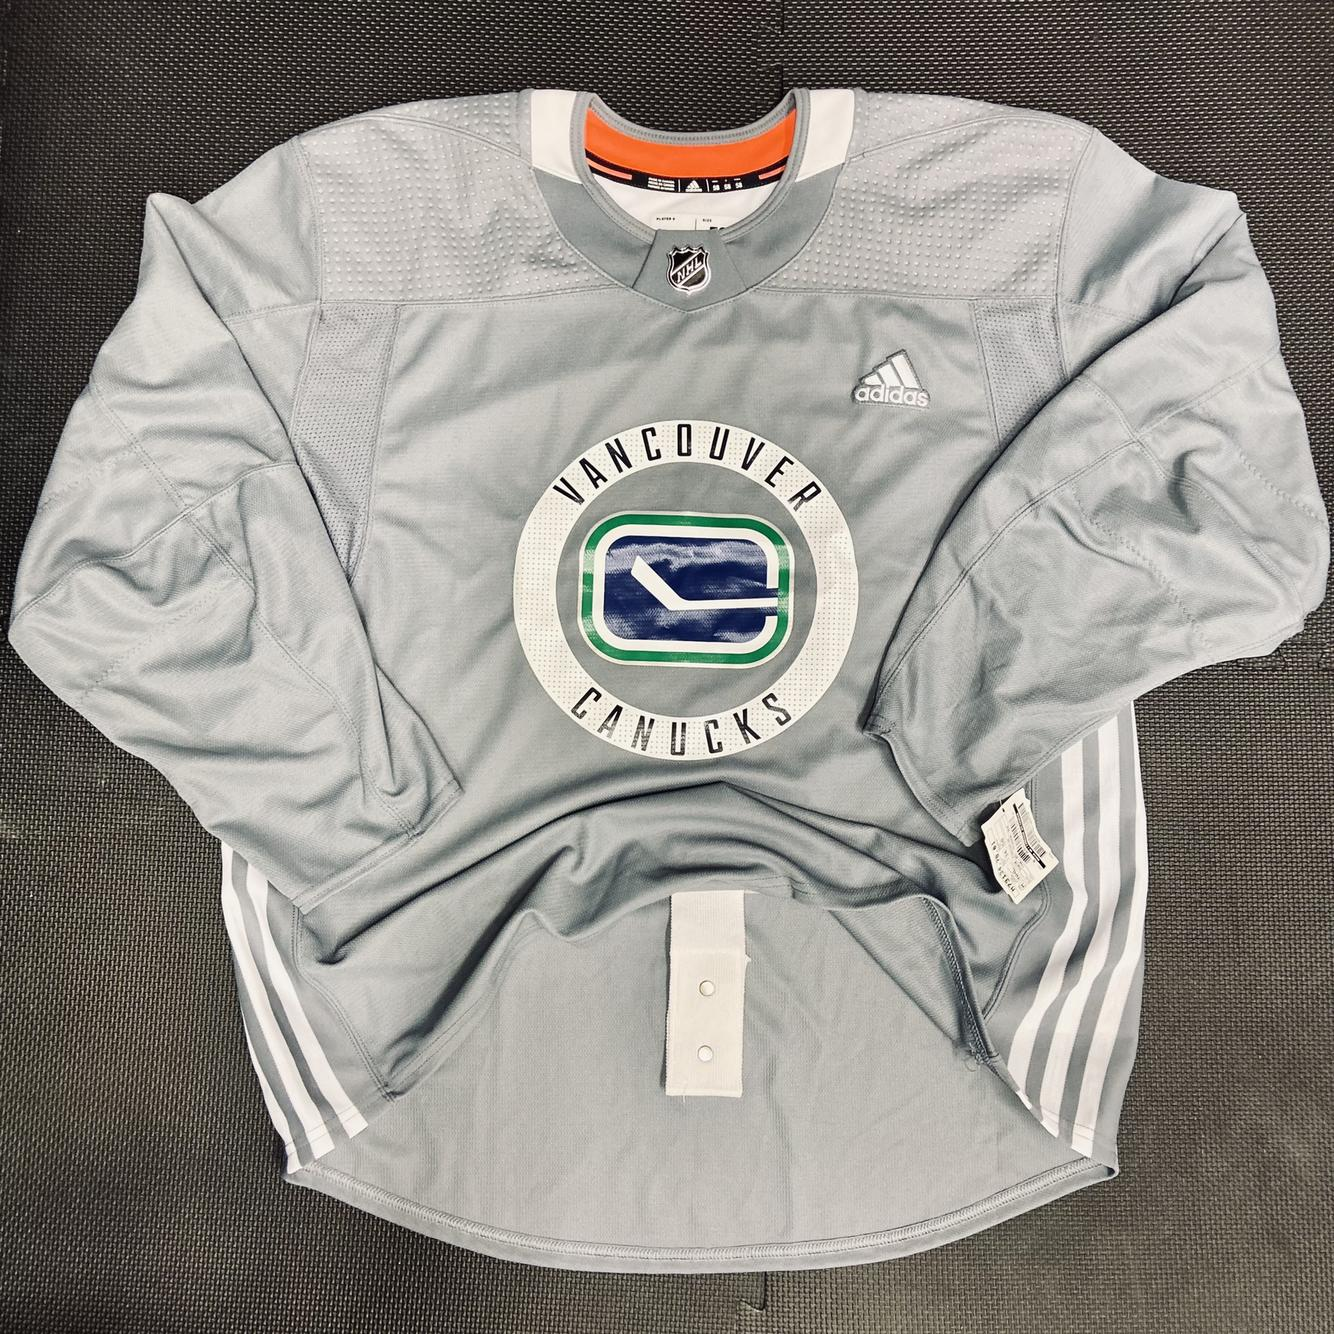 New Vancouver Canucks Pro Stock Practice Jersey • 58 Goalie Adidas ...